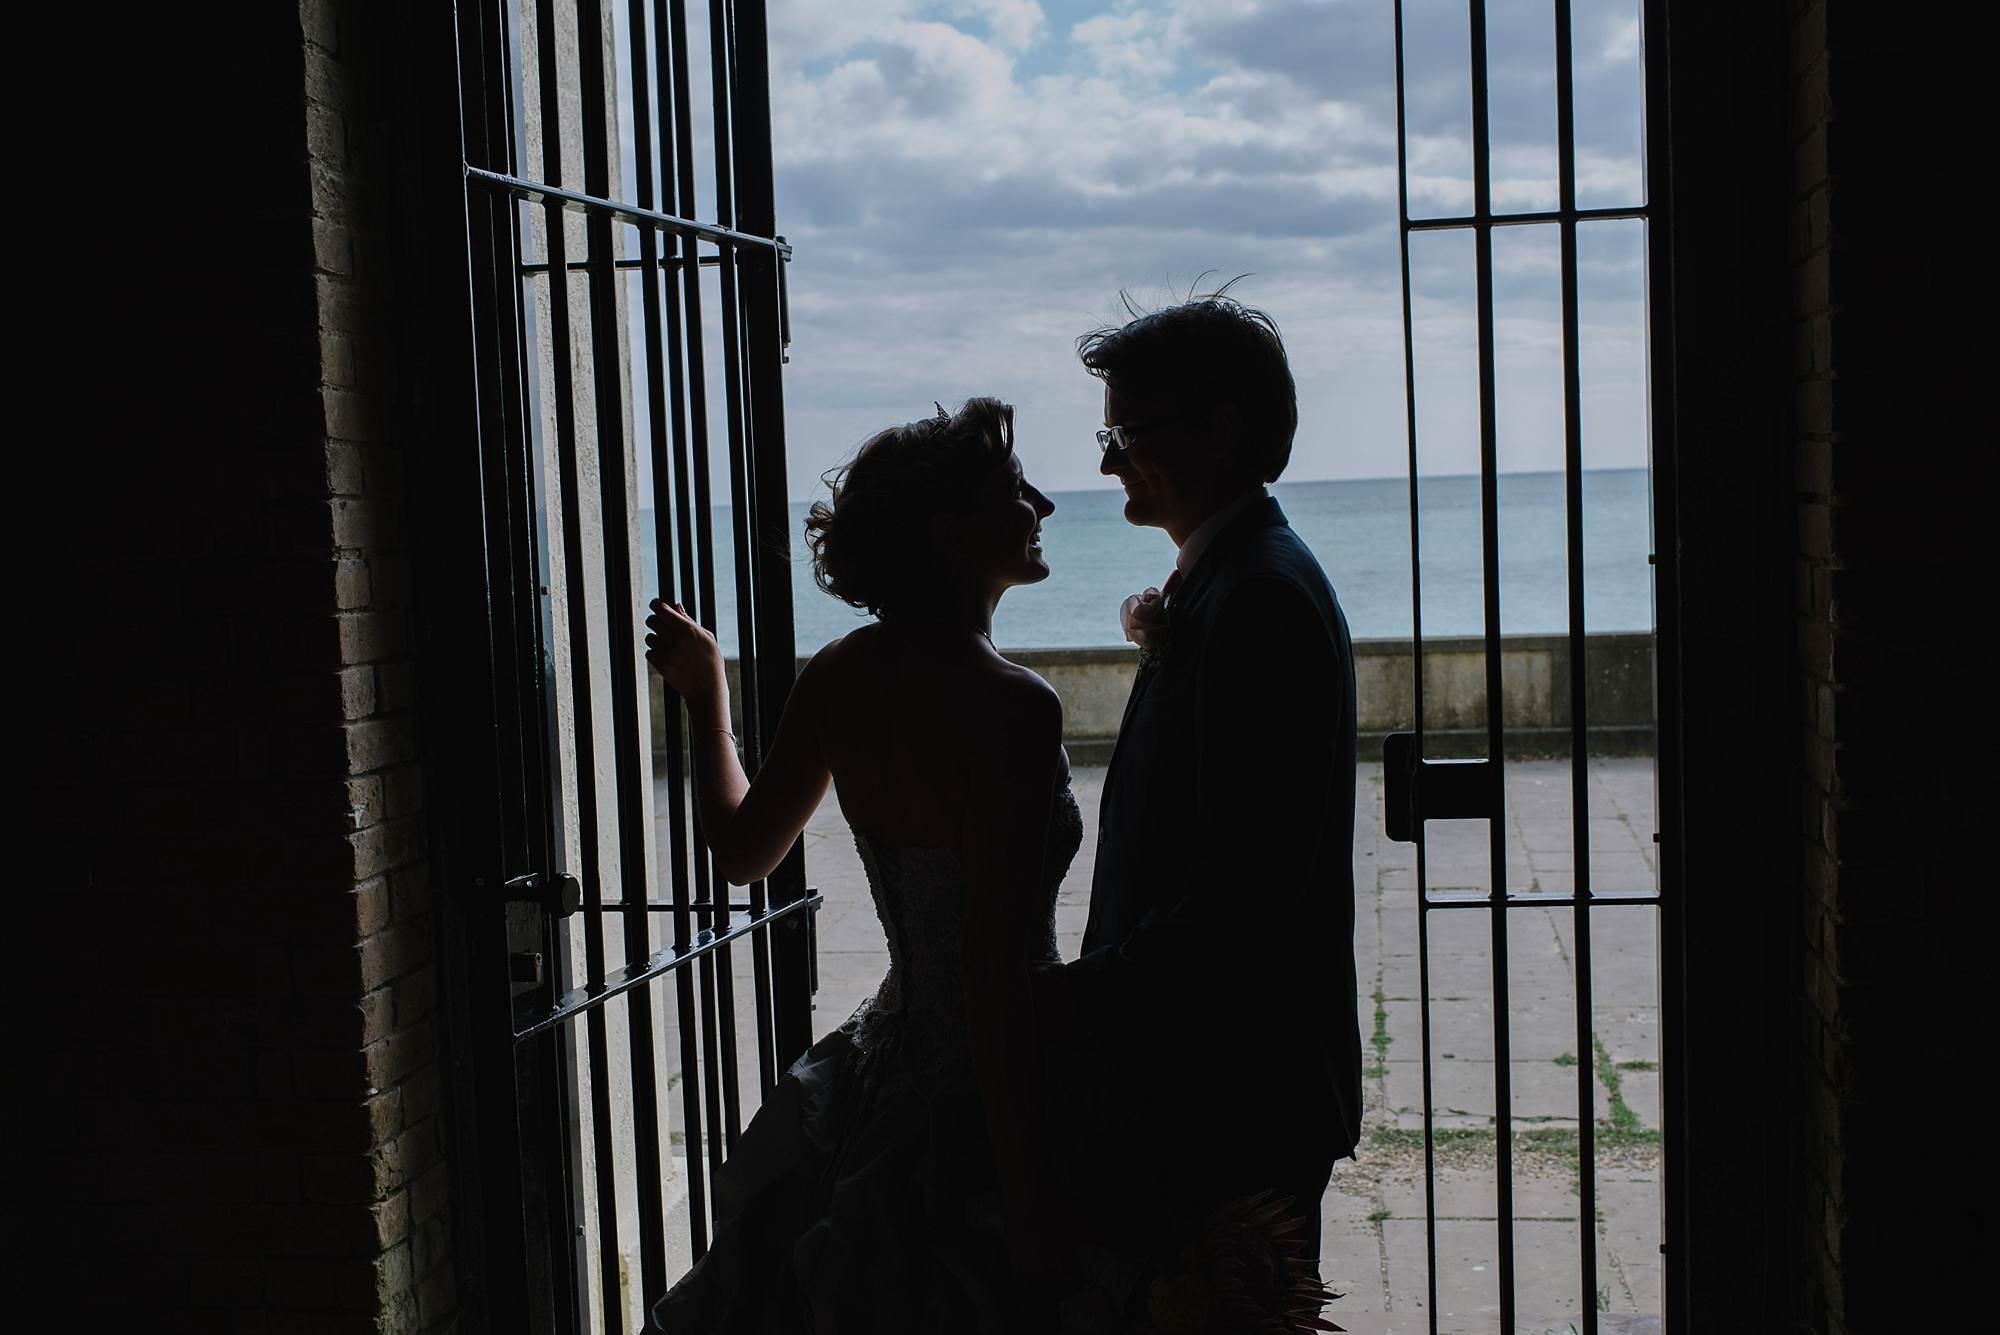 bride and groom brighton beach, jacqui mcsweeney photography